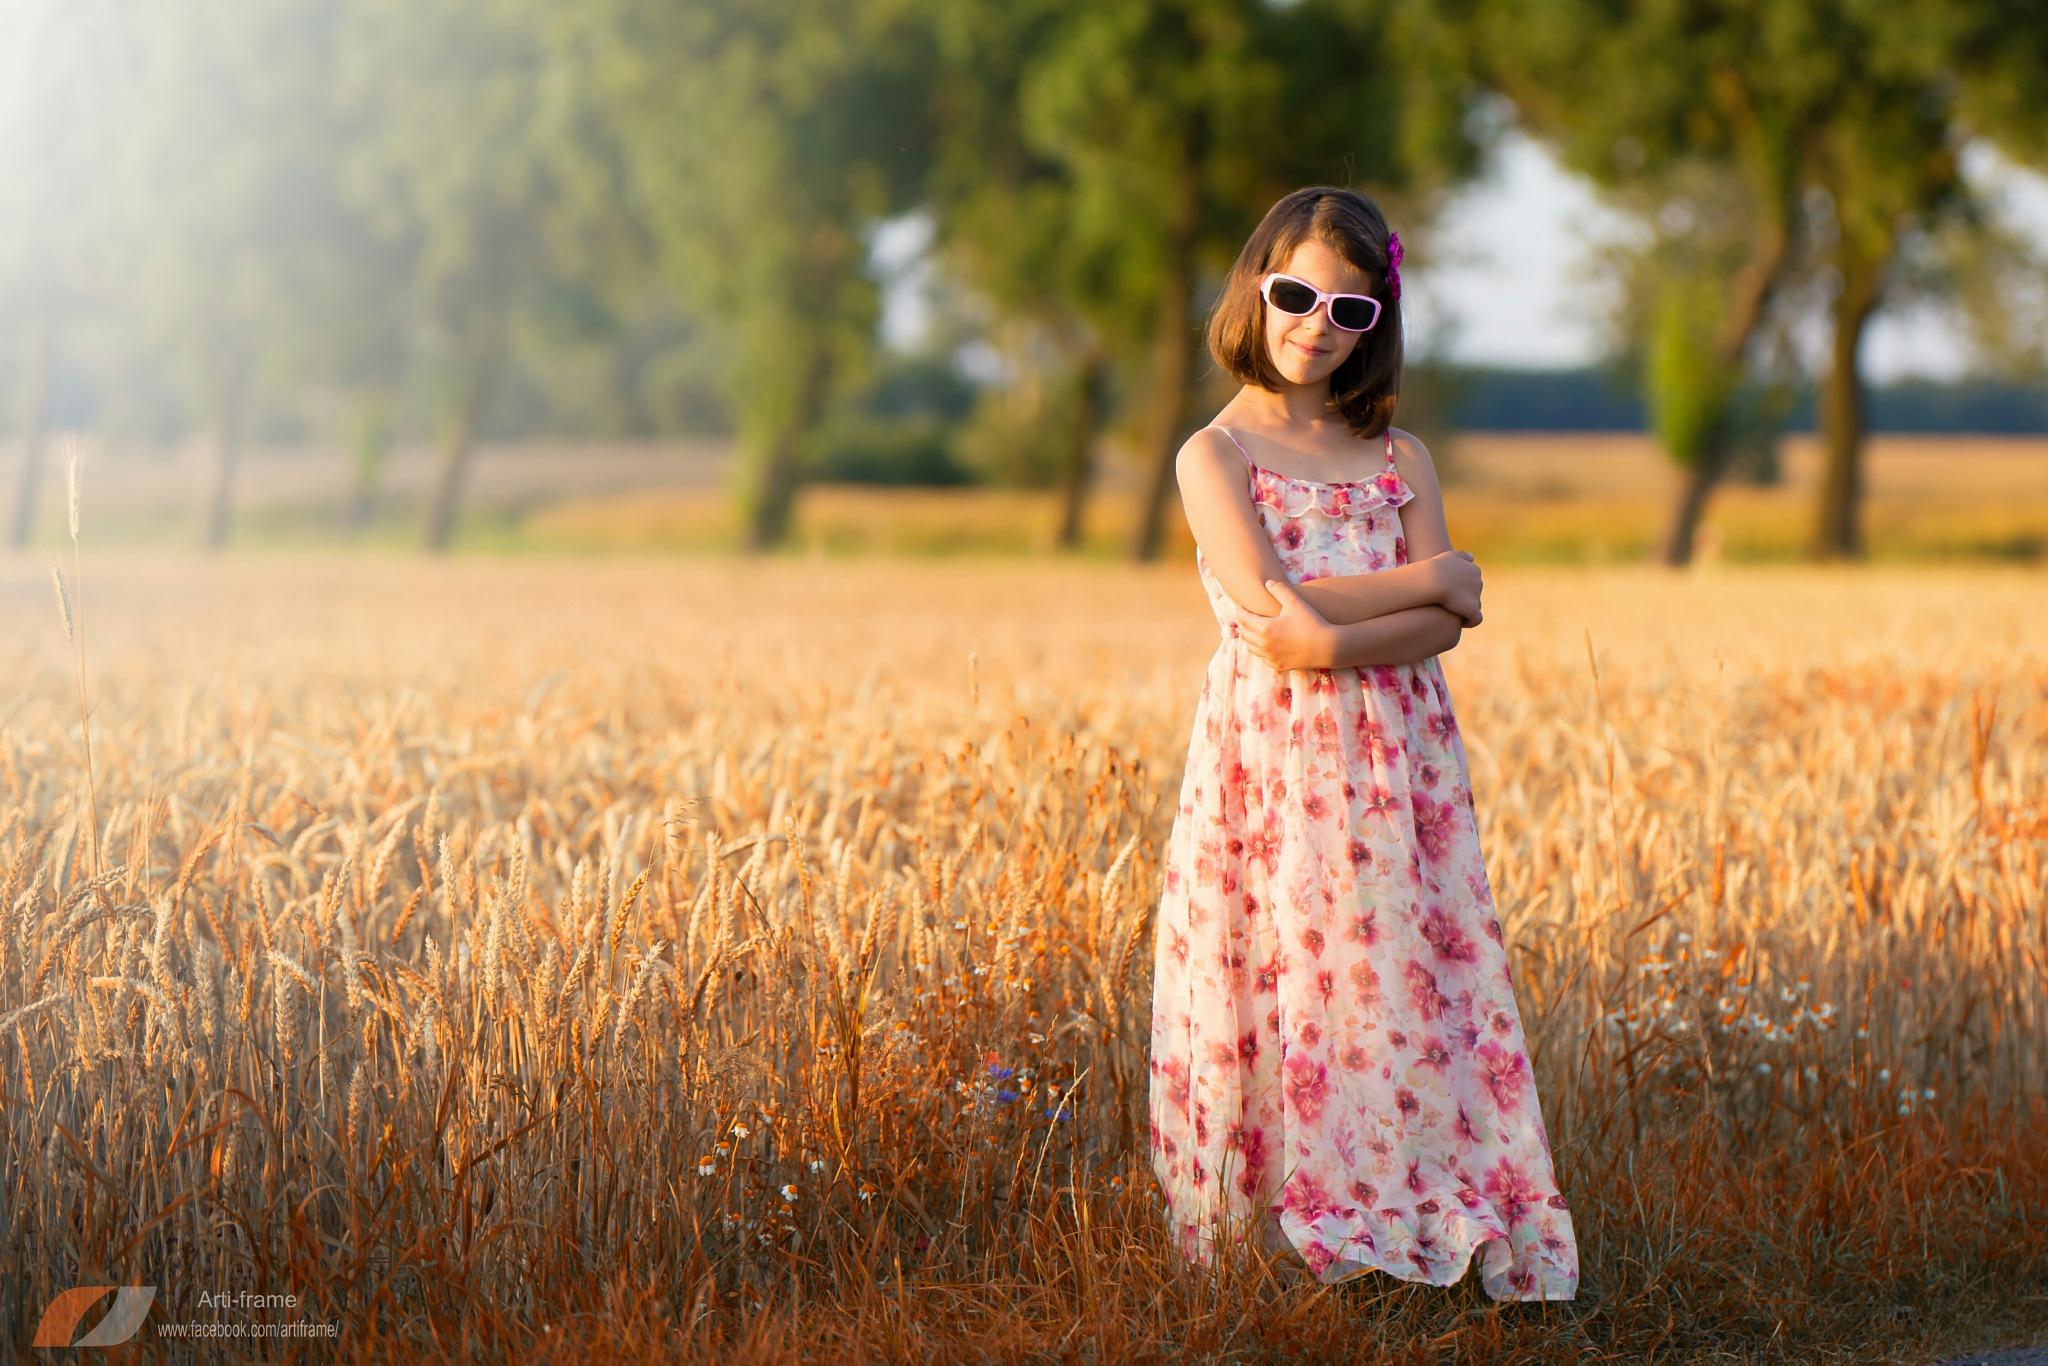 sunglasses by Artur Budny